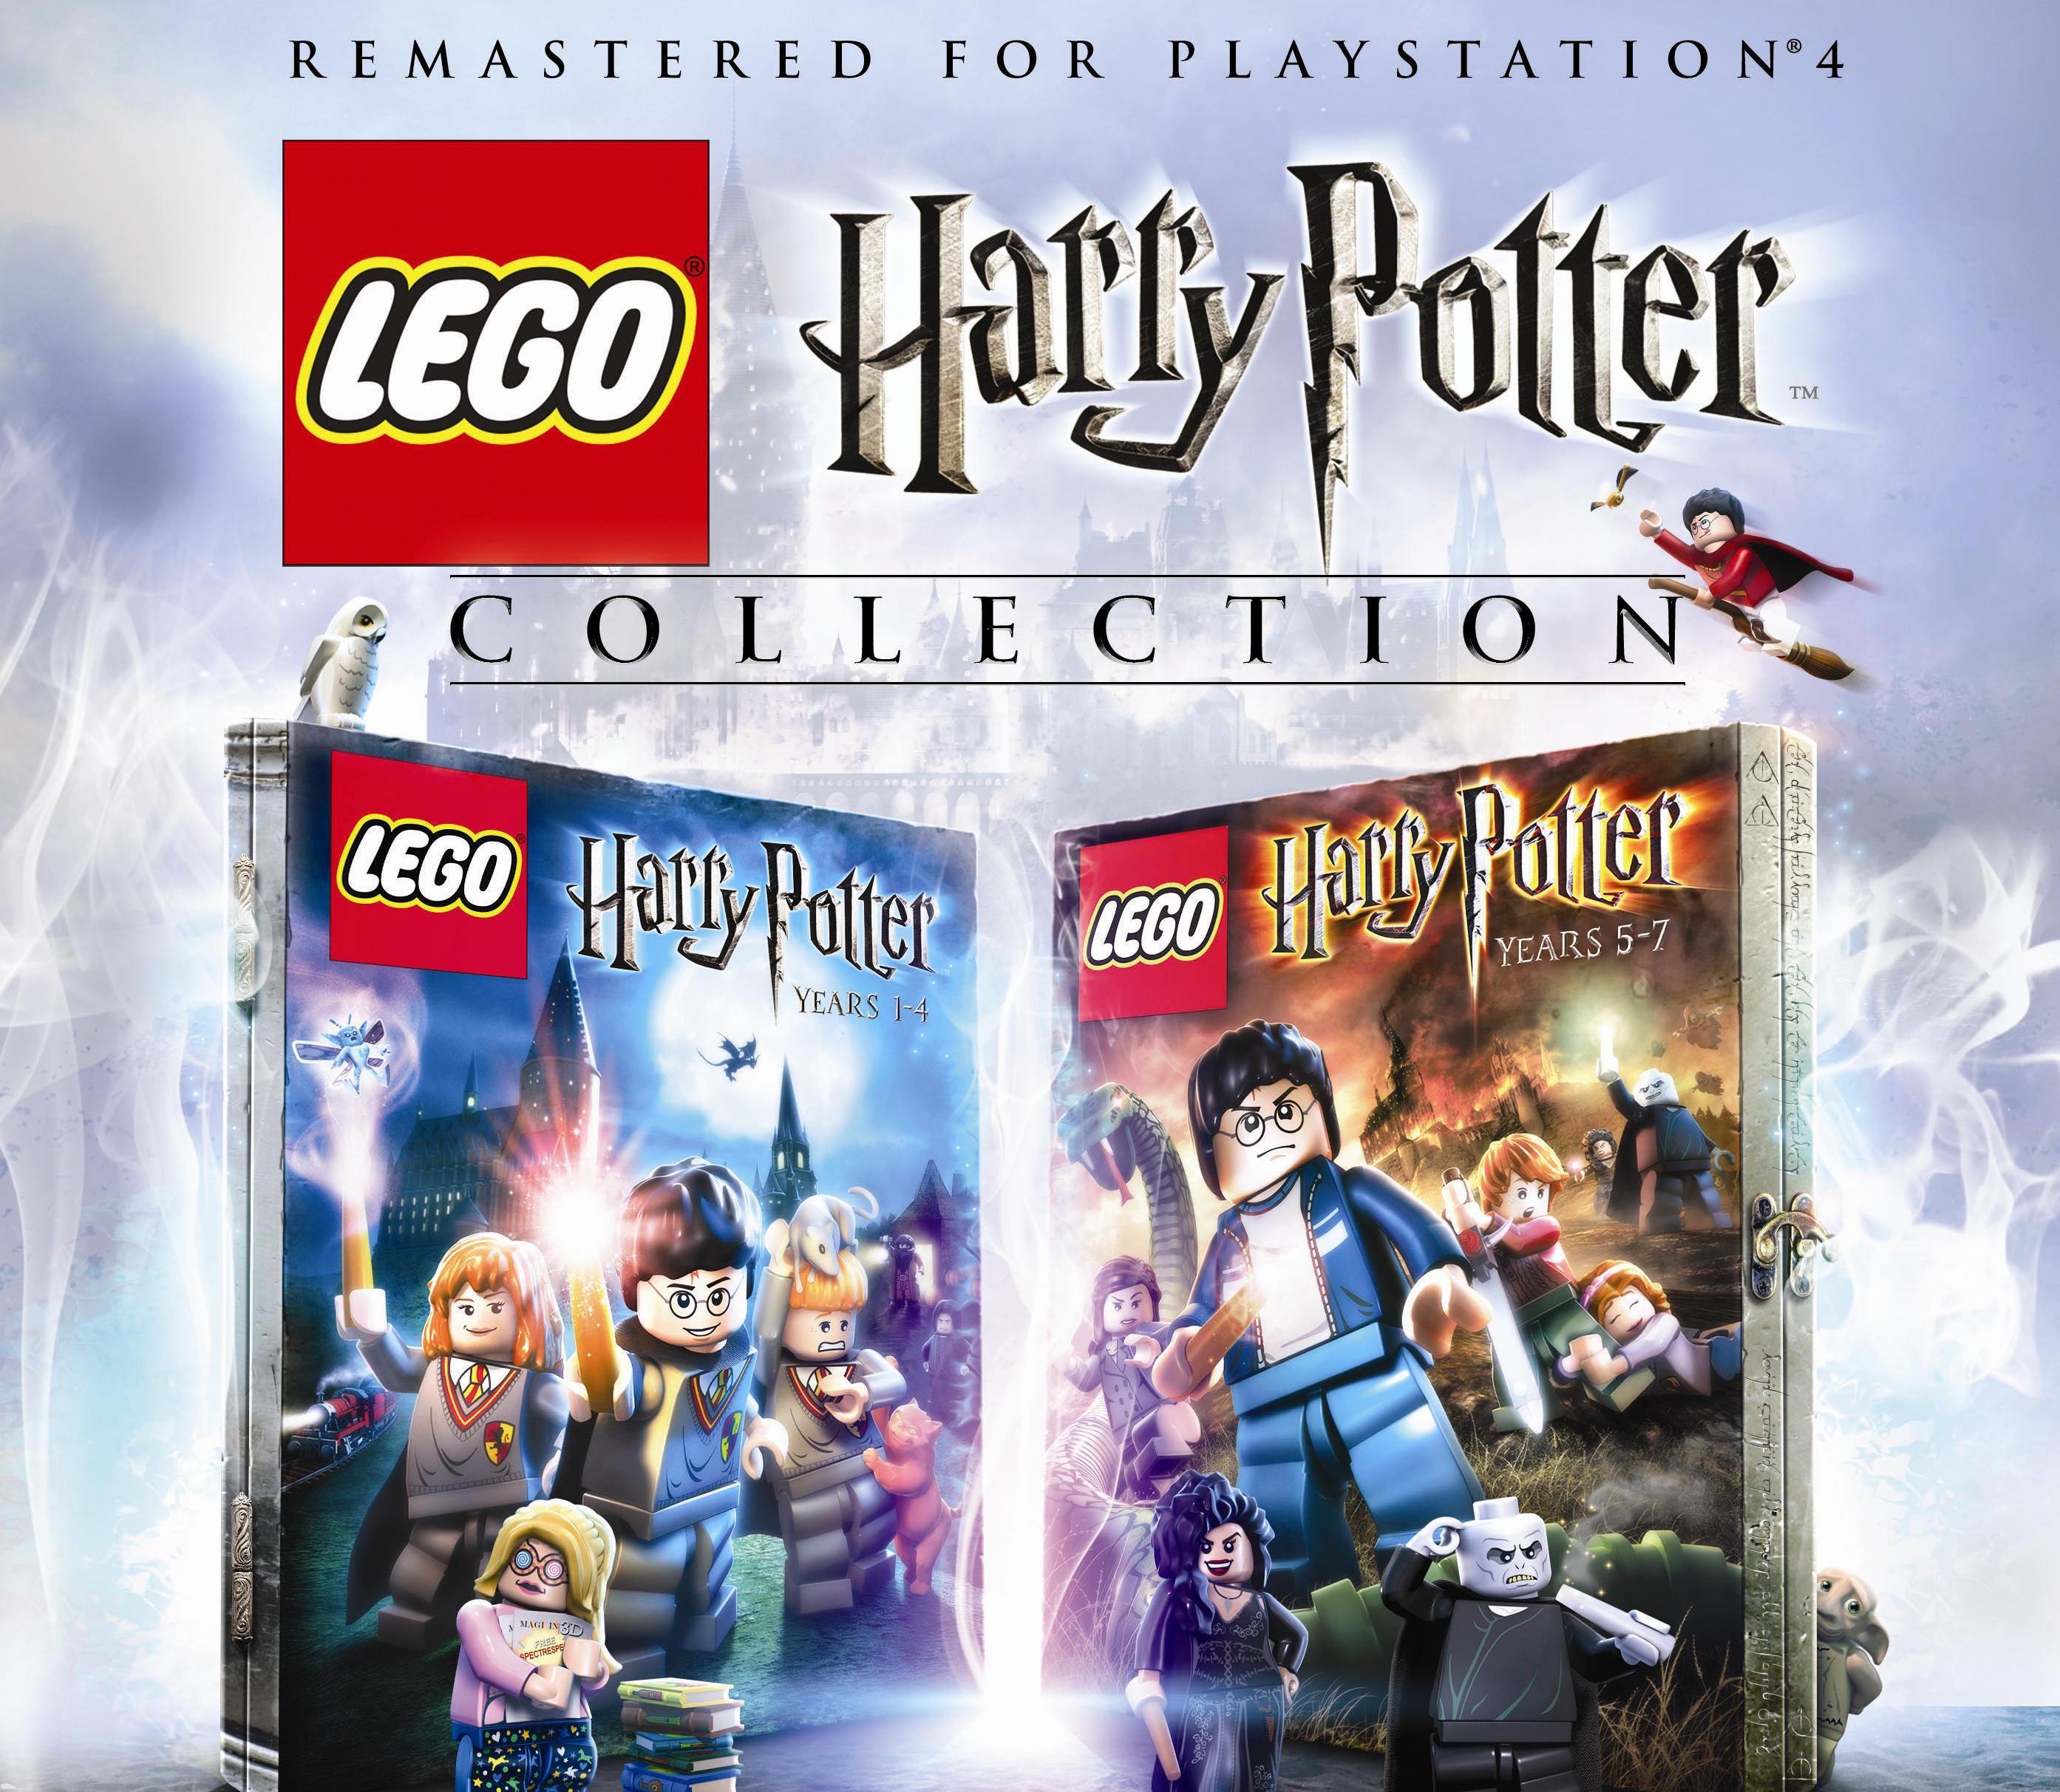 LEGO Harry Potter Collection sbarcherà su PlayStation 4